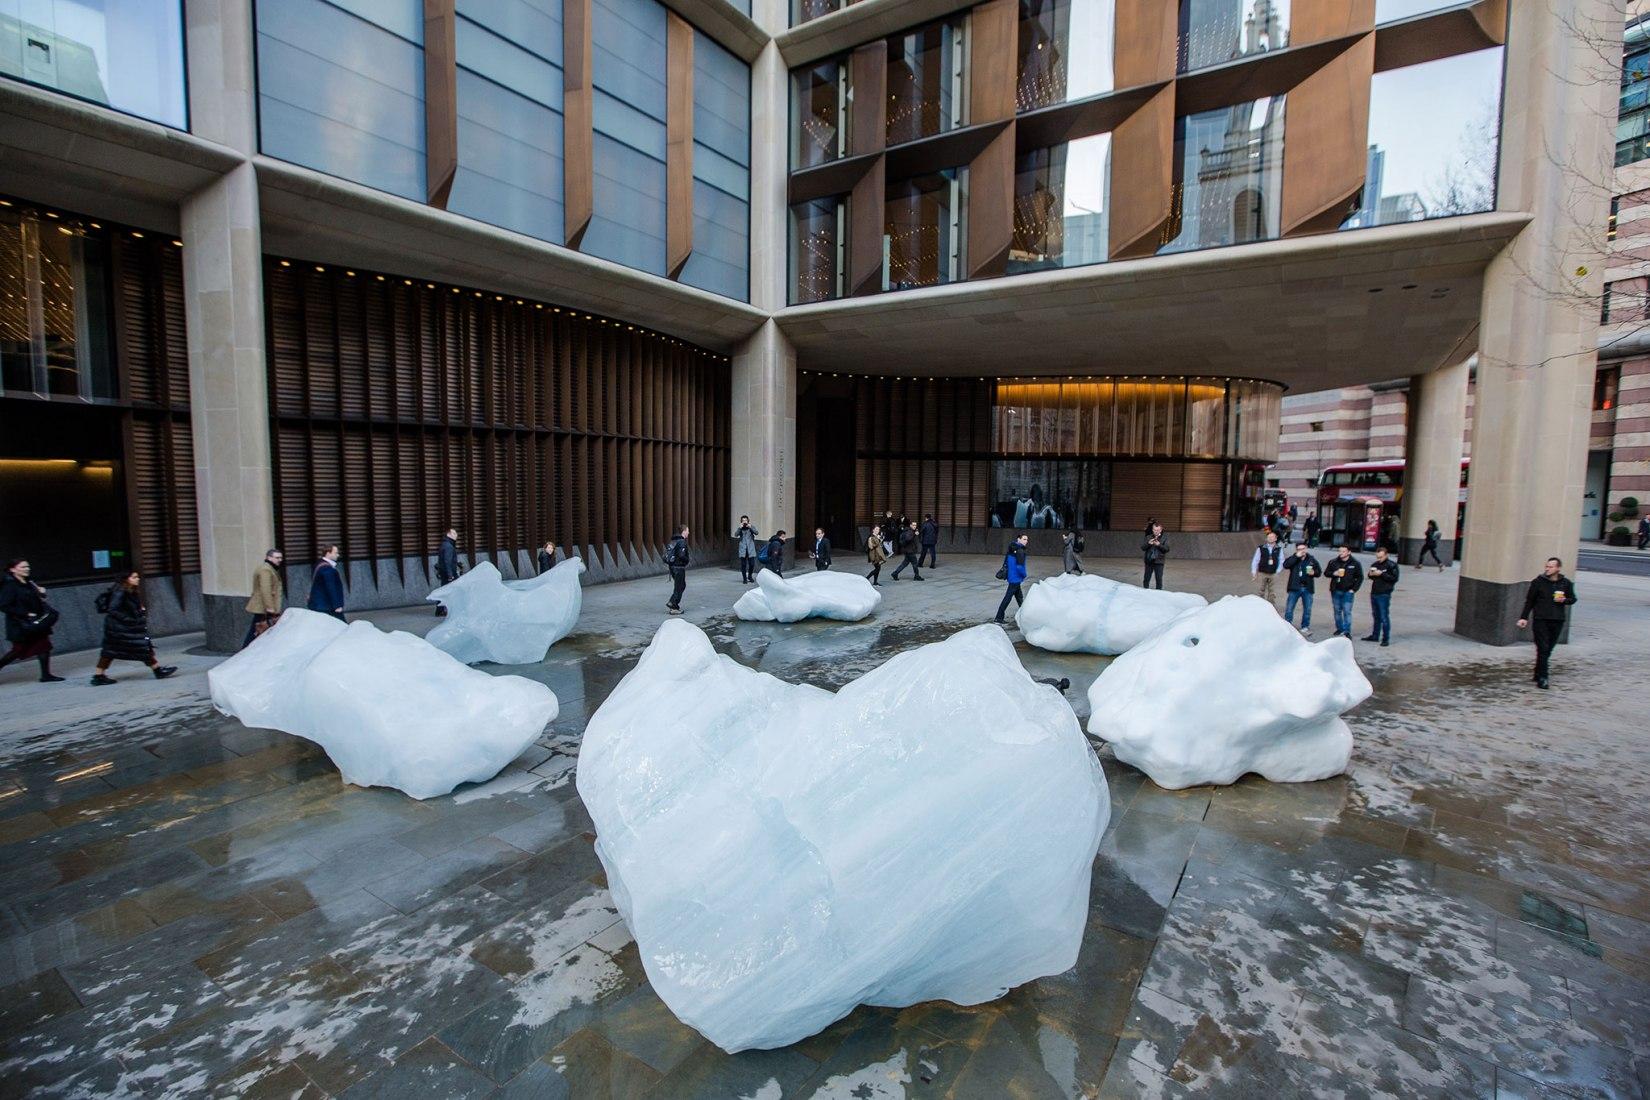 Tate Modern. Ice Watch Londres por Olafur Eliasson y Minik Rosing. Fotografía por Charlie Forgham Bailey